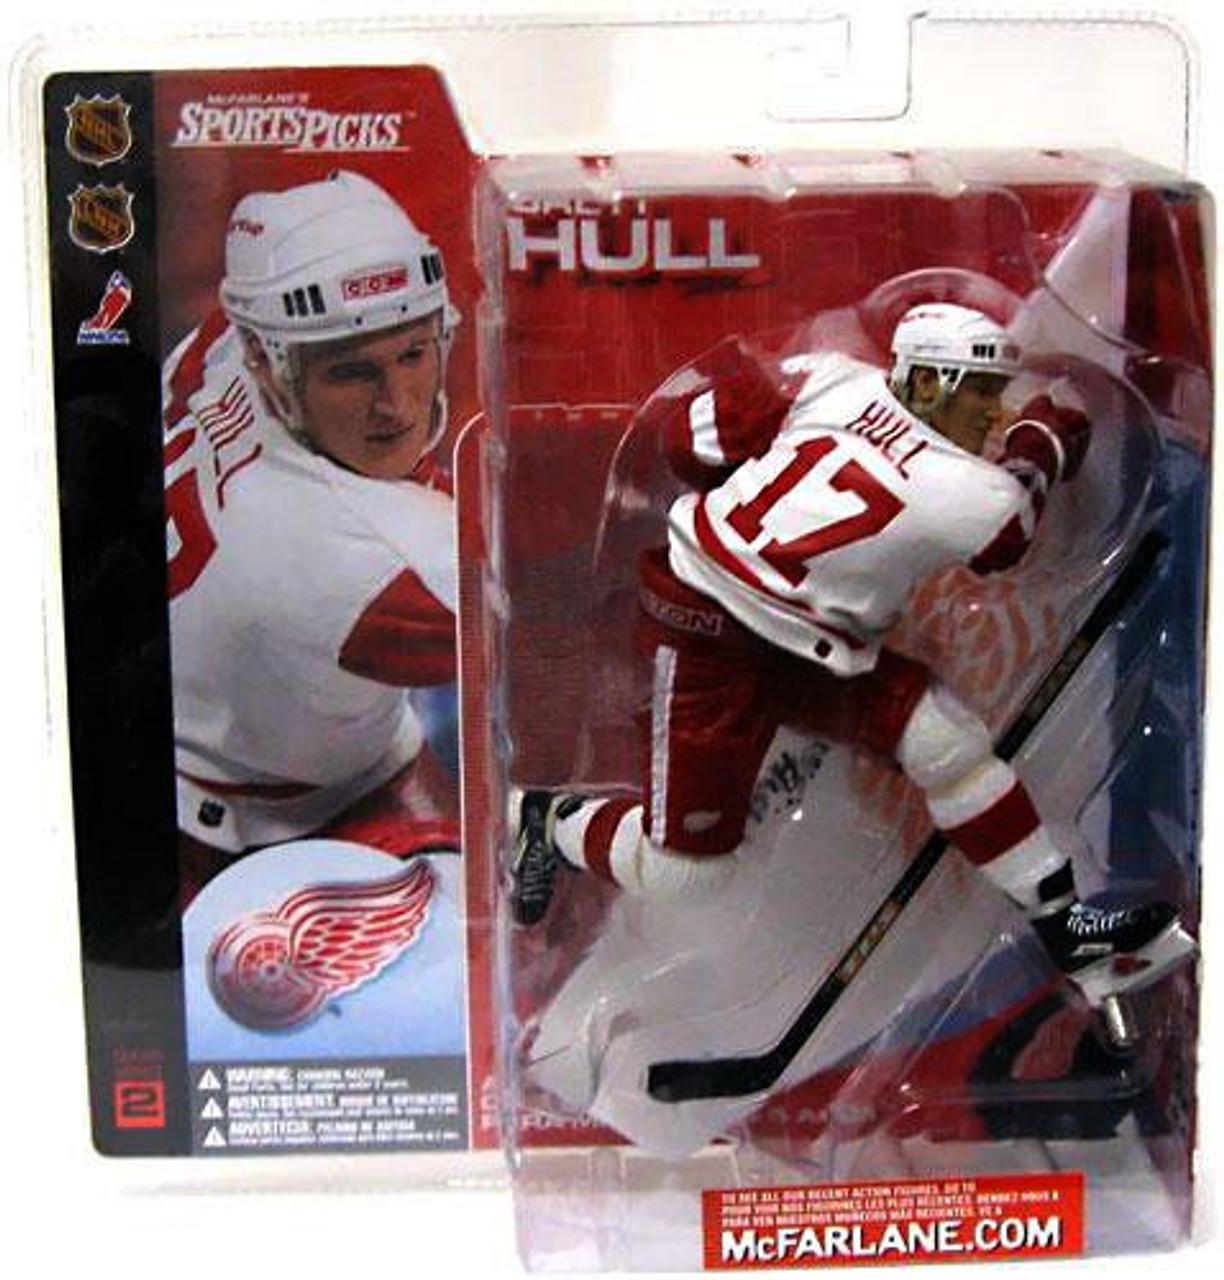 brand new 9c3b9 5e160 McFarlane Toys NHL Detroit Red Wings Sports Picks Series 2 Brett Hull  Action Figure